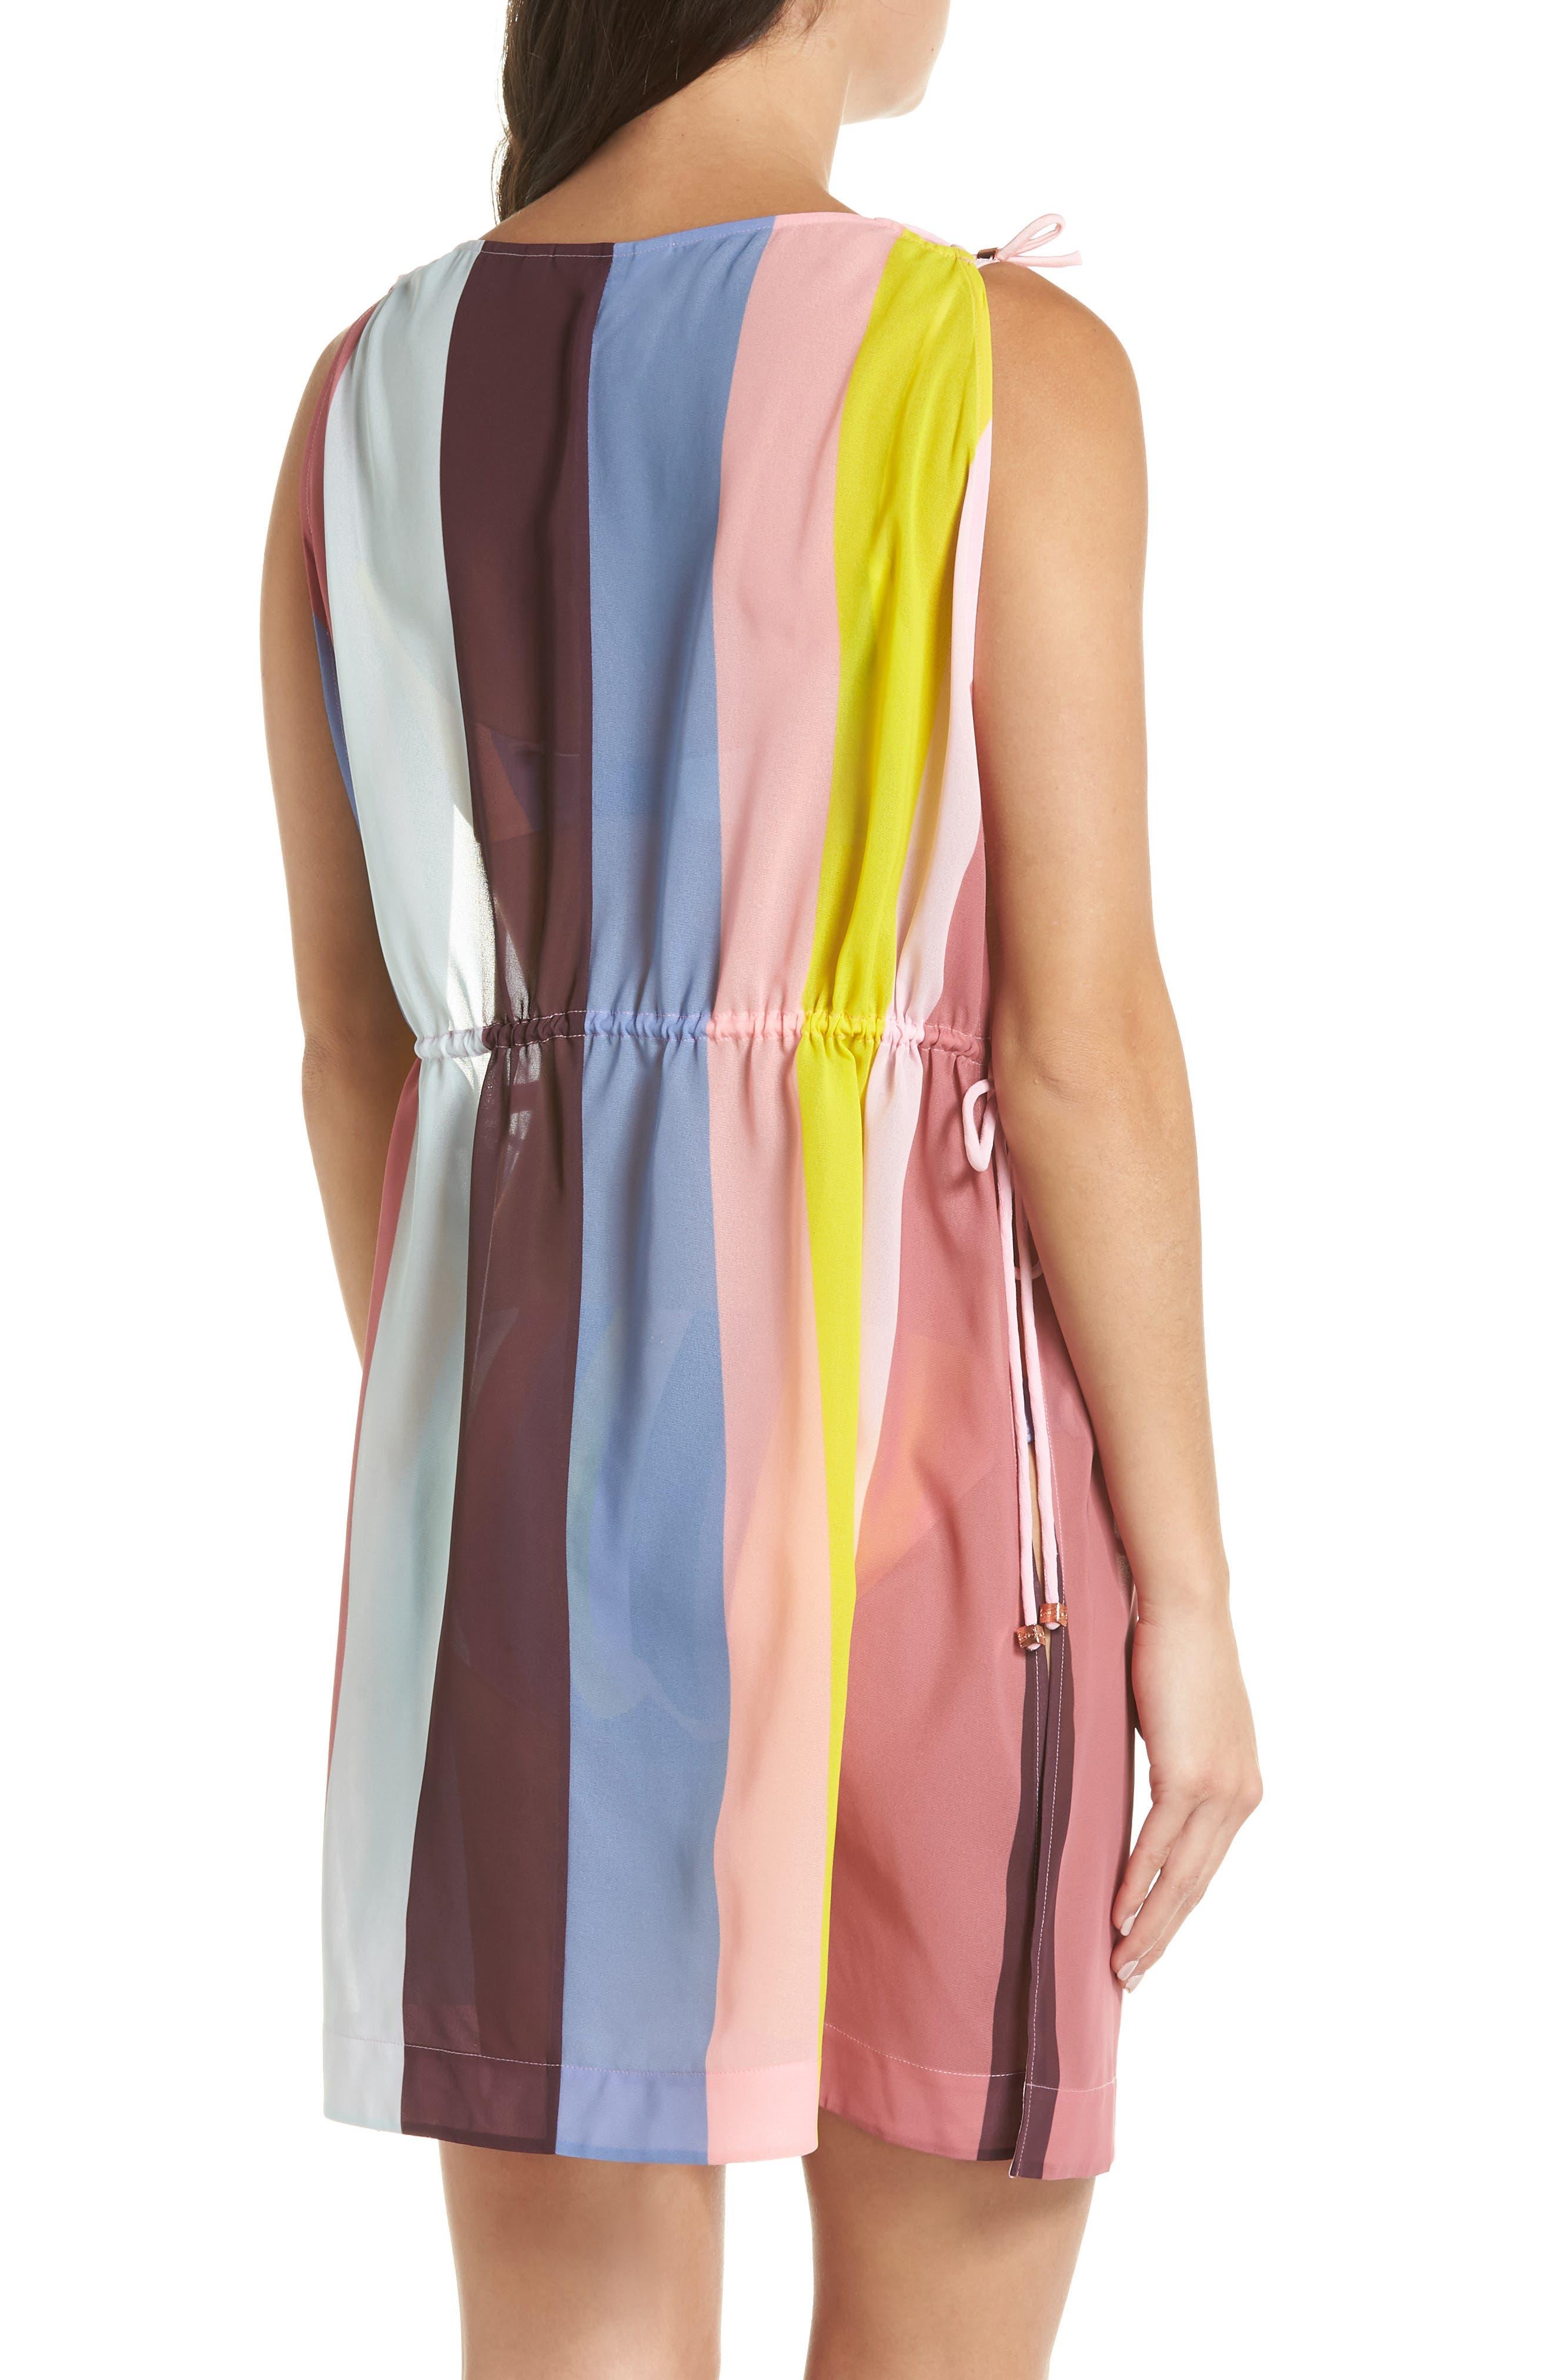 Penaree Rio Stripe Tabbard Cover-Up,                             Alternate thumbnail 2, color,                             LIGHT PINK